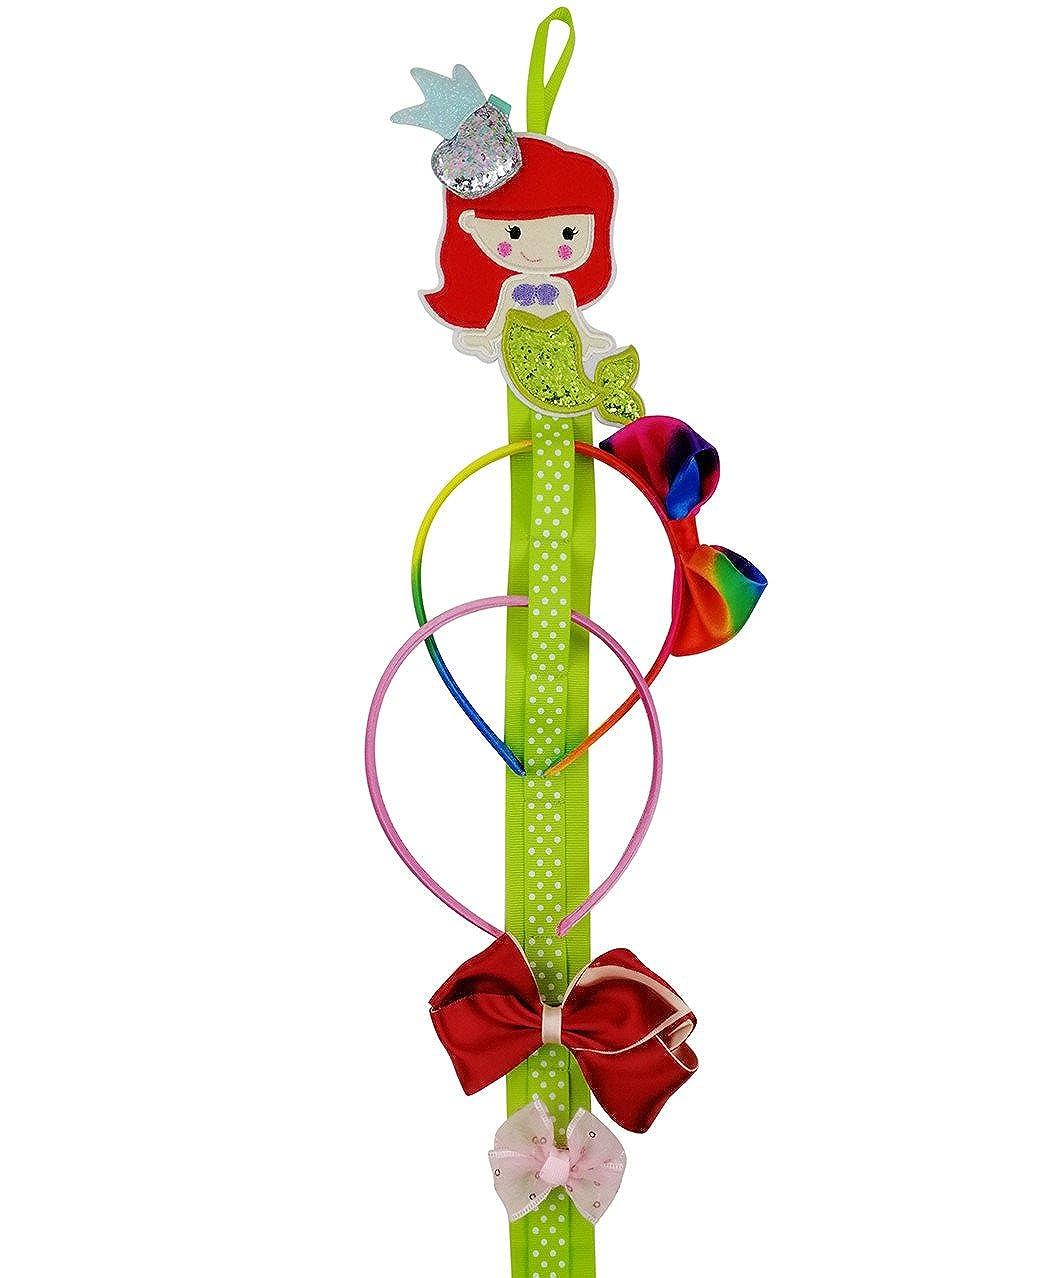 Hixixi Baby Girls Mermaid Ribbon Headband and Hair Clips Holder Storage Organizer F012